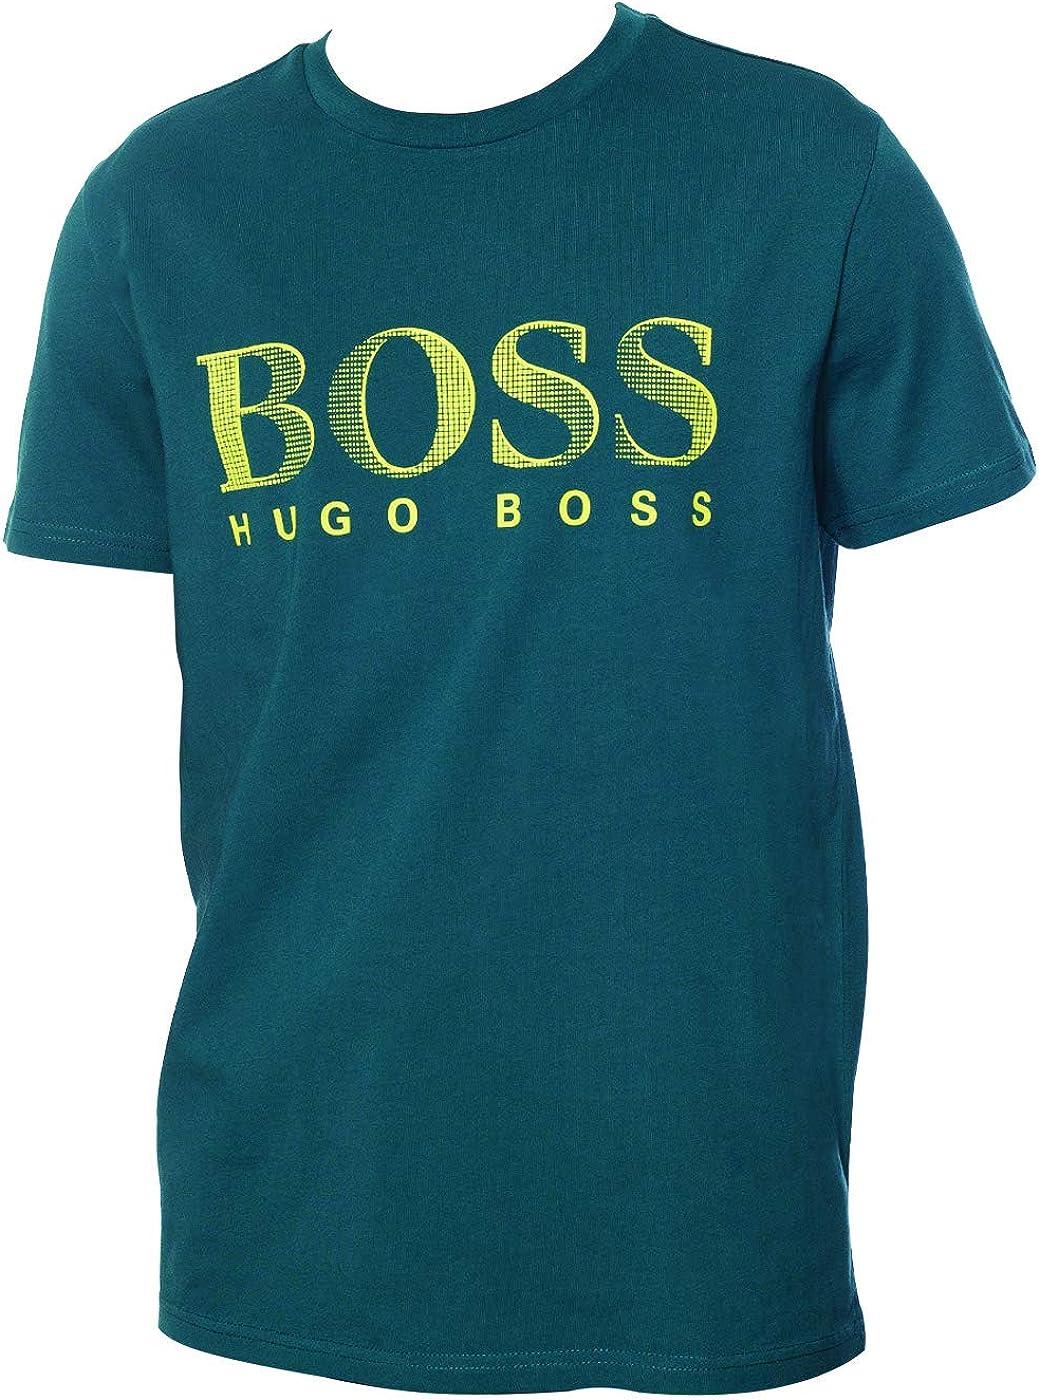 Hugo Boss Mens Rashguard Shirt Rash Guard Shirt